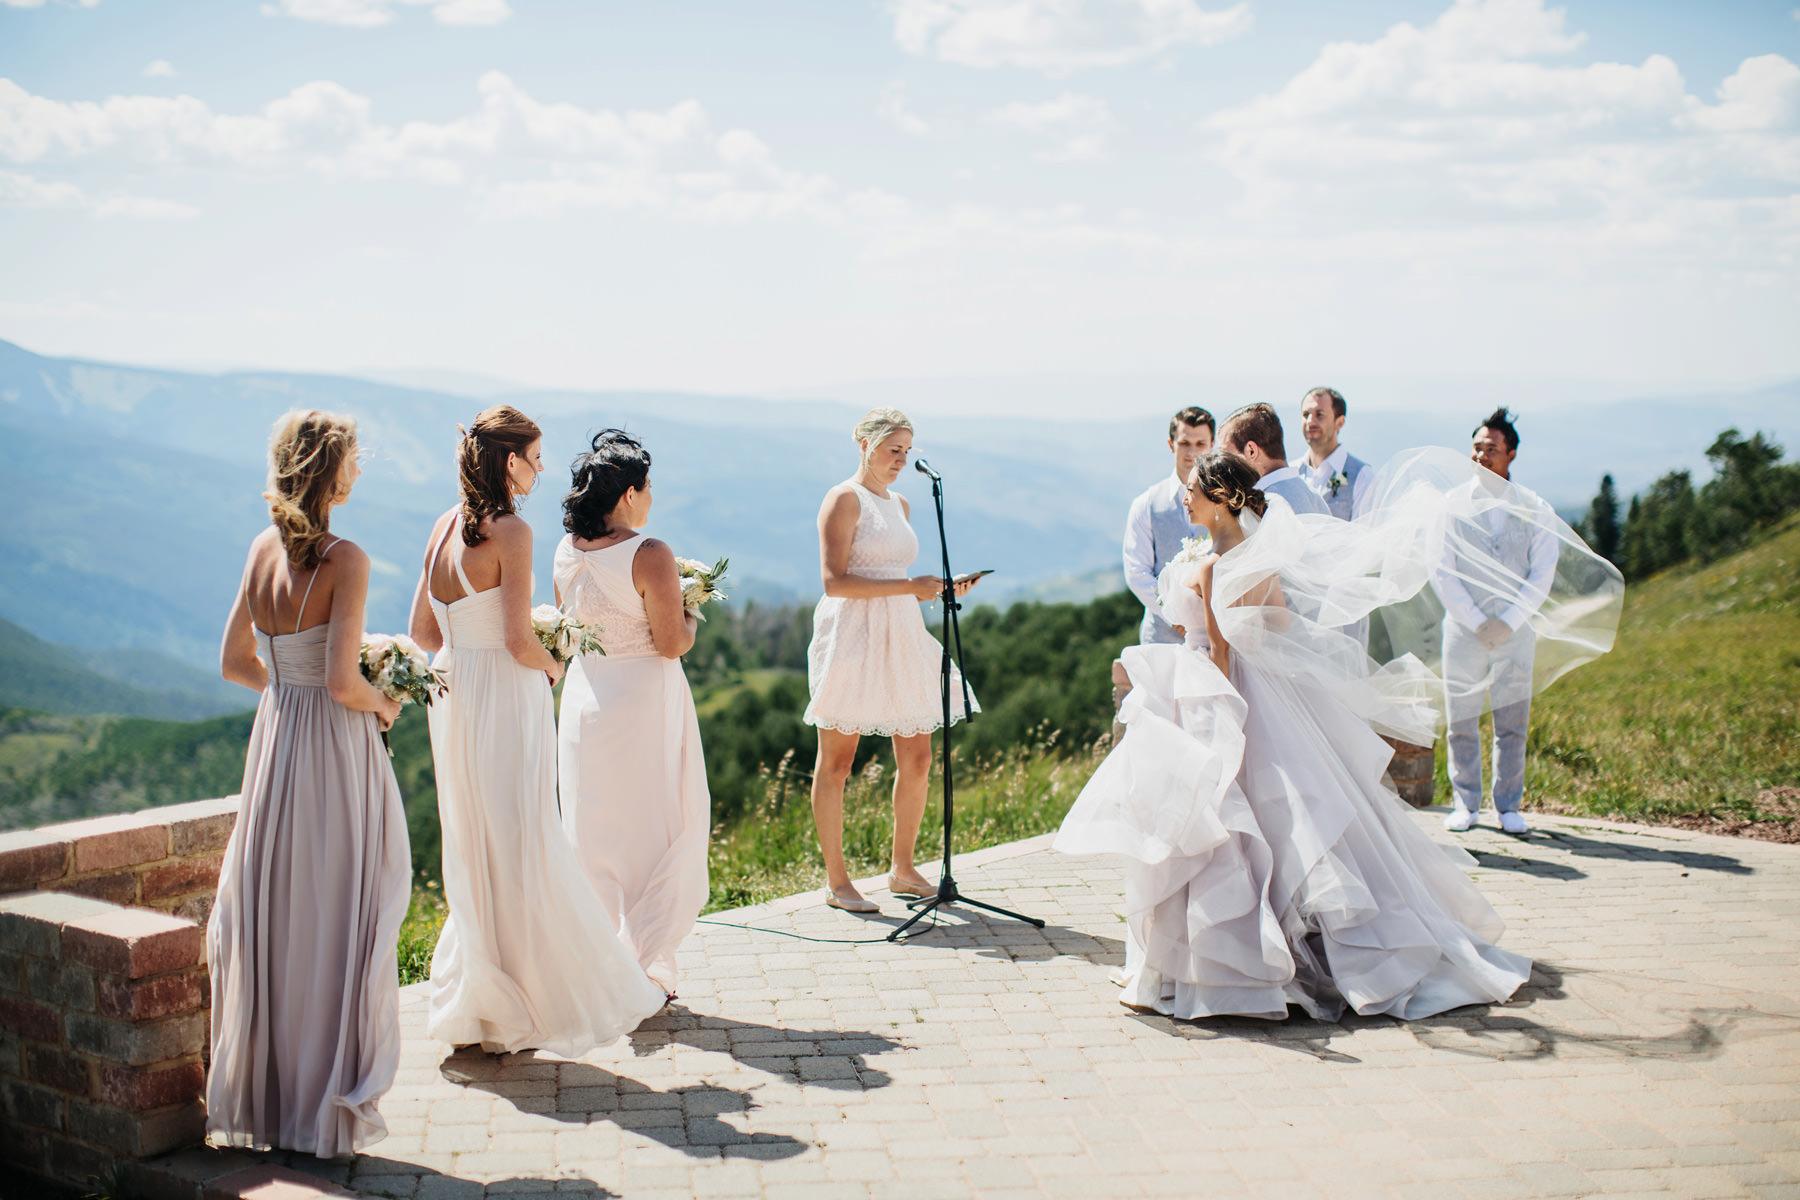 Vail Colorado Wedding Deck_ Kindling Wedding Photography34.JPG